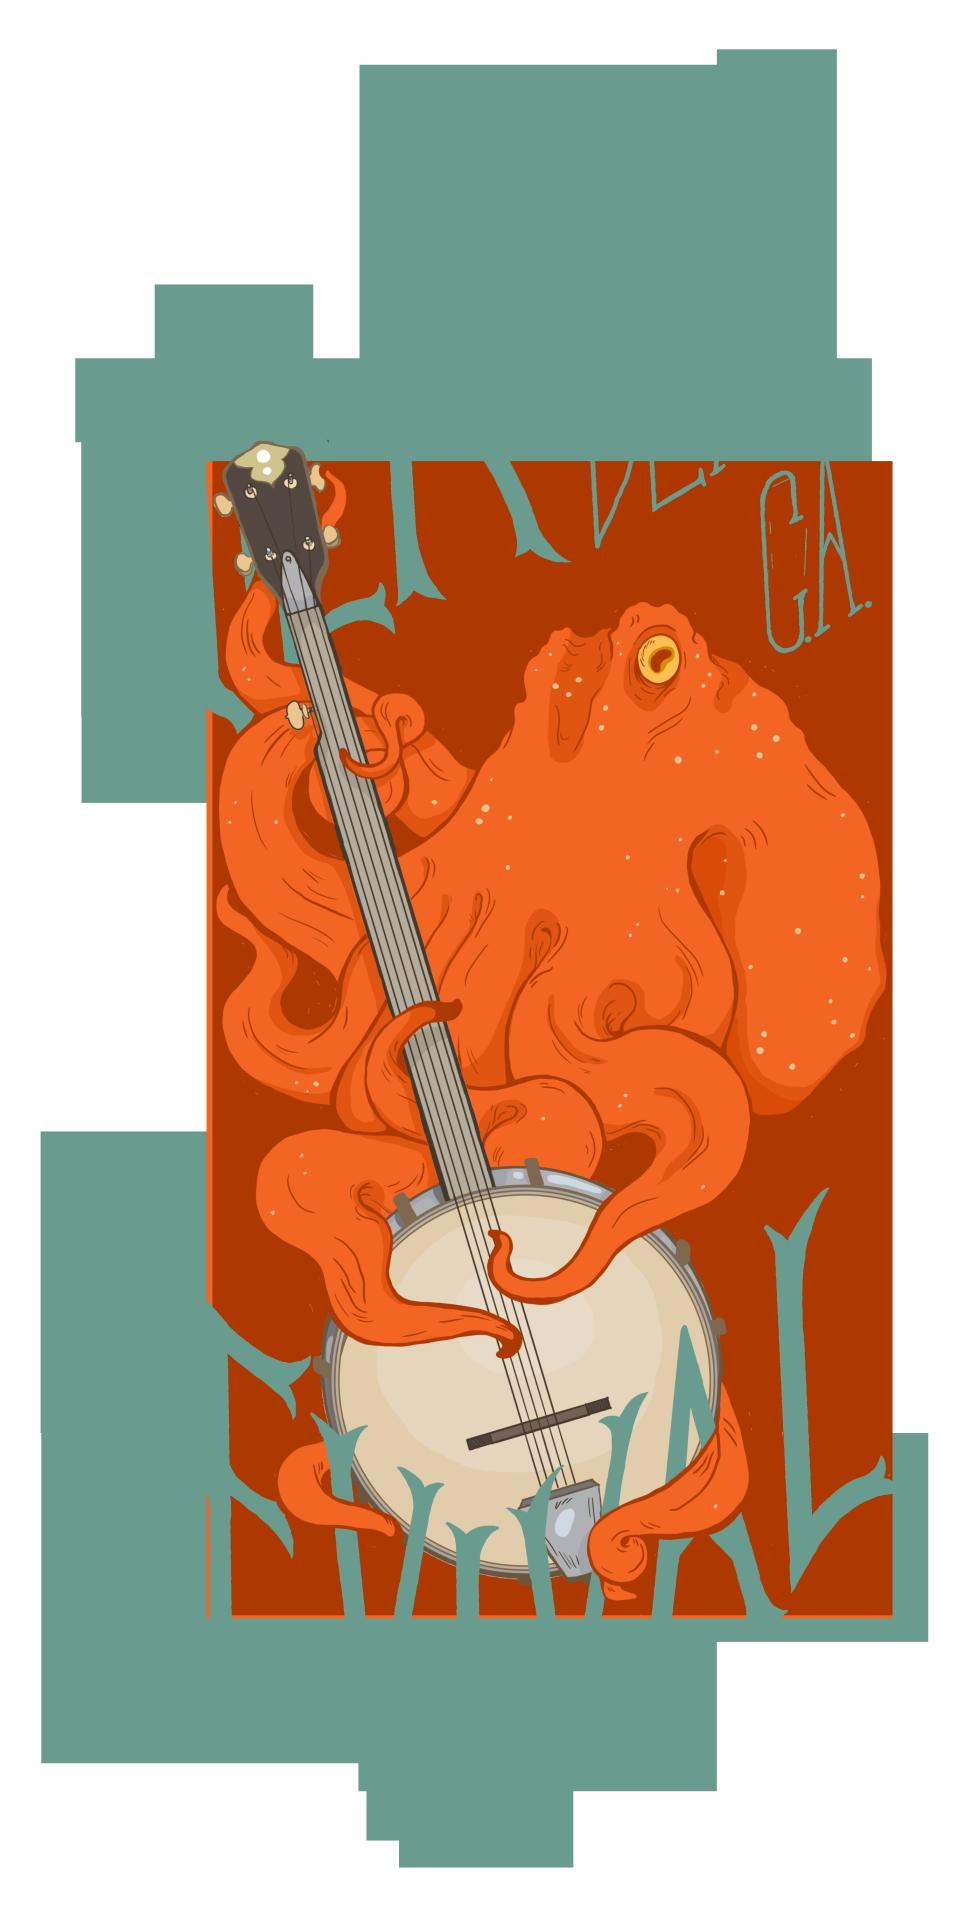 Hillbilly clipart banjo. An octopus would make